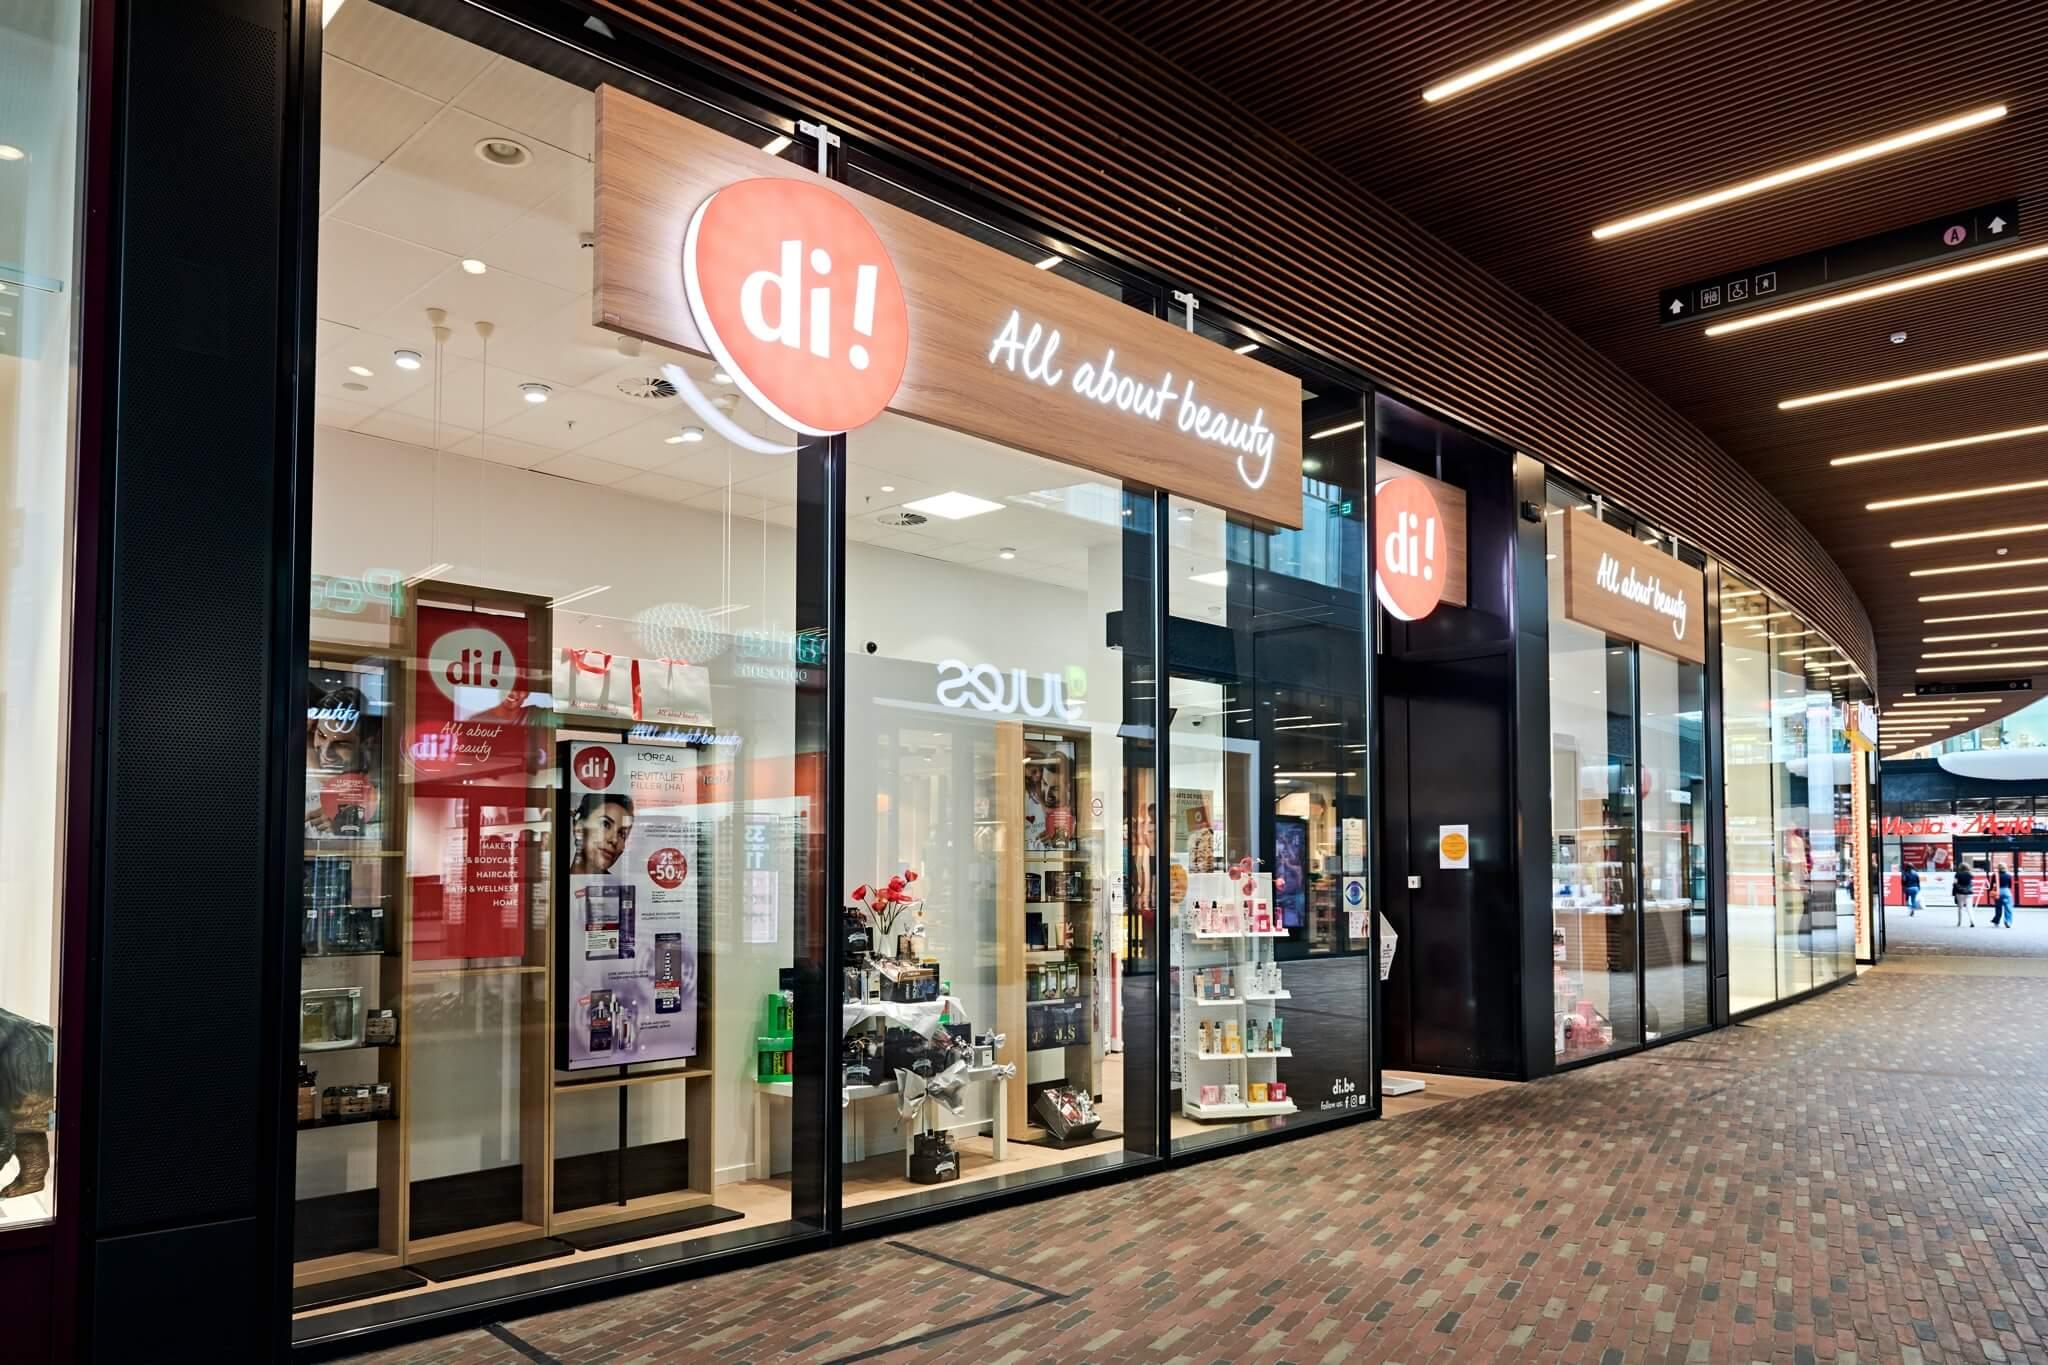 Di! | Docks Bruxsel | Shopping Center in Brussels